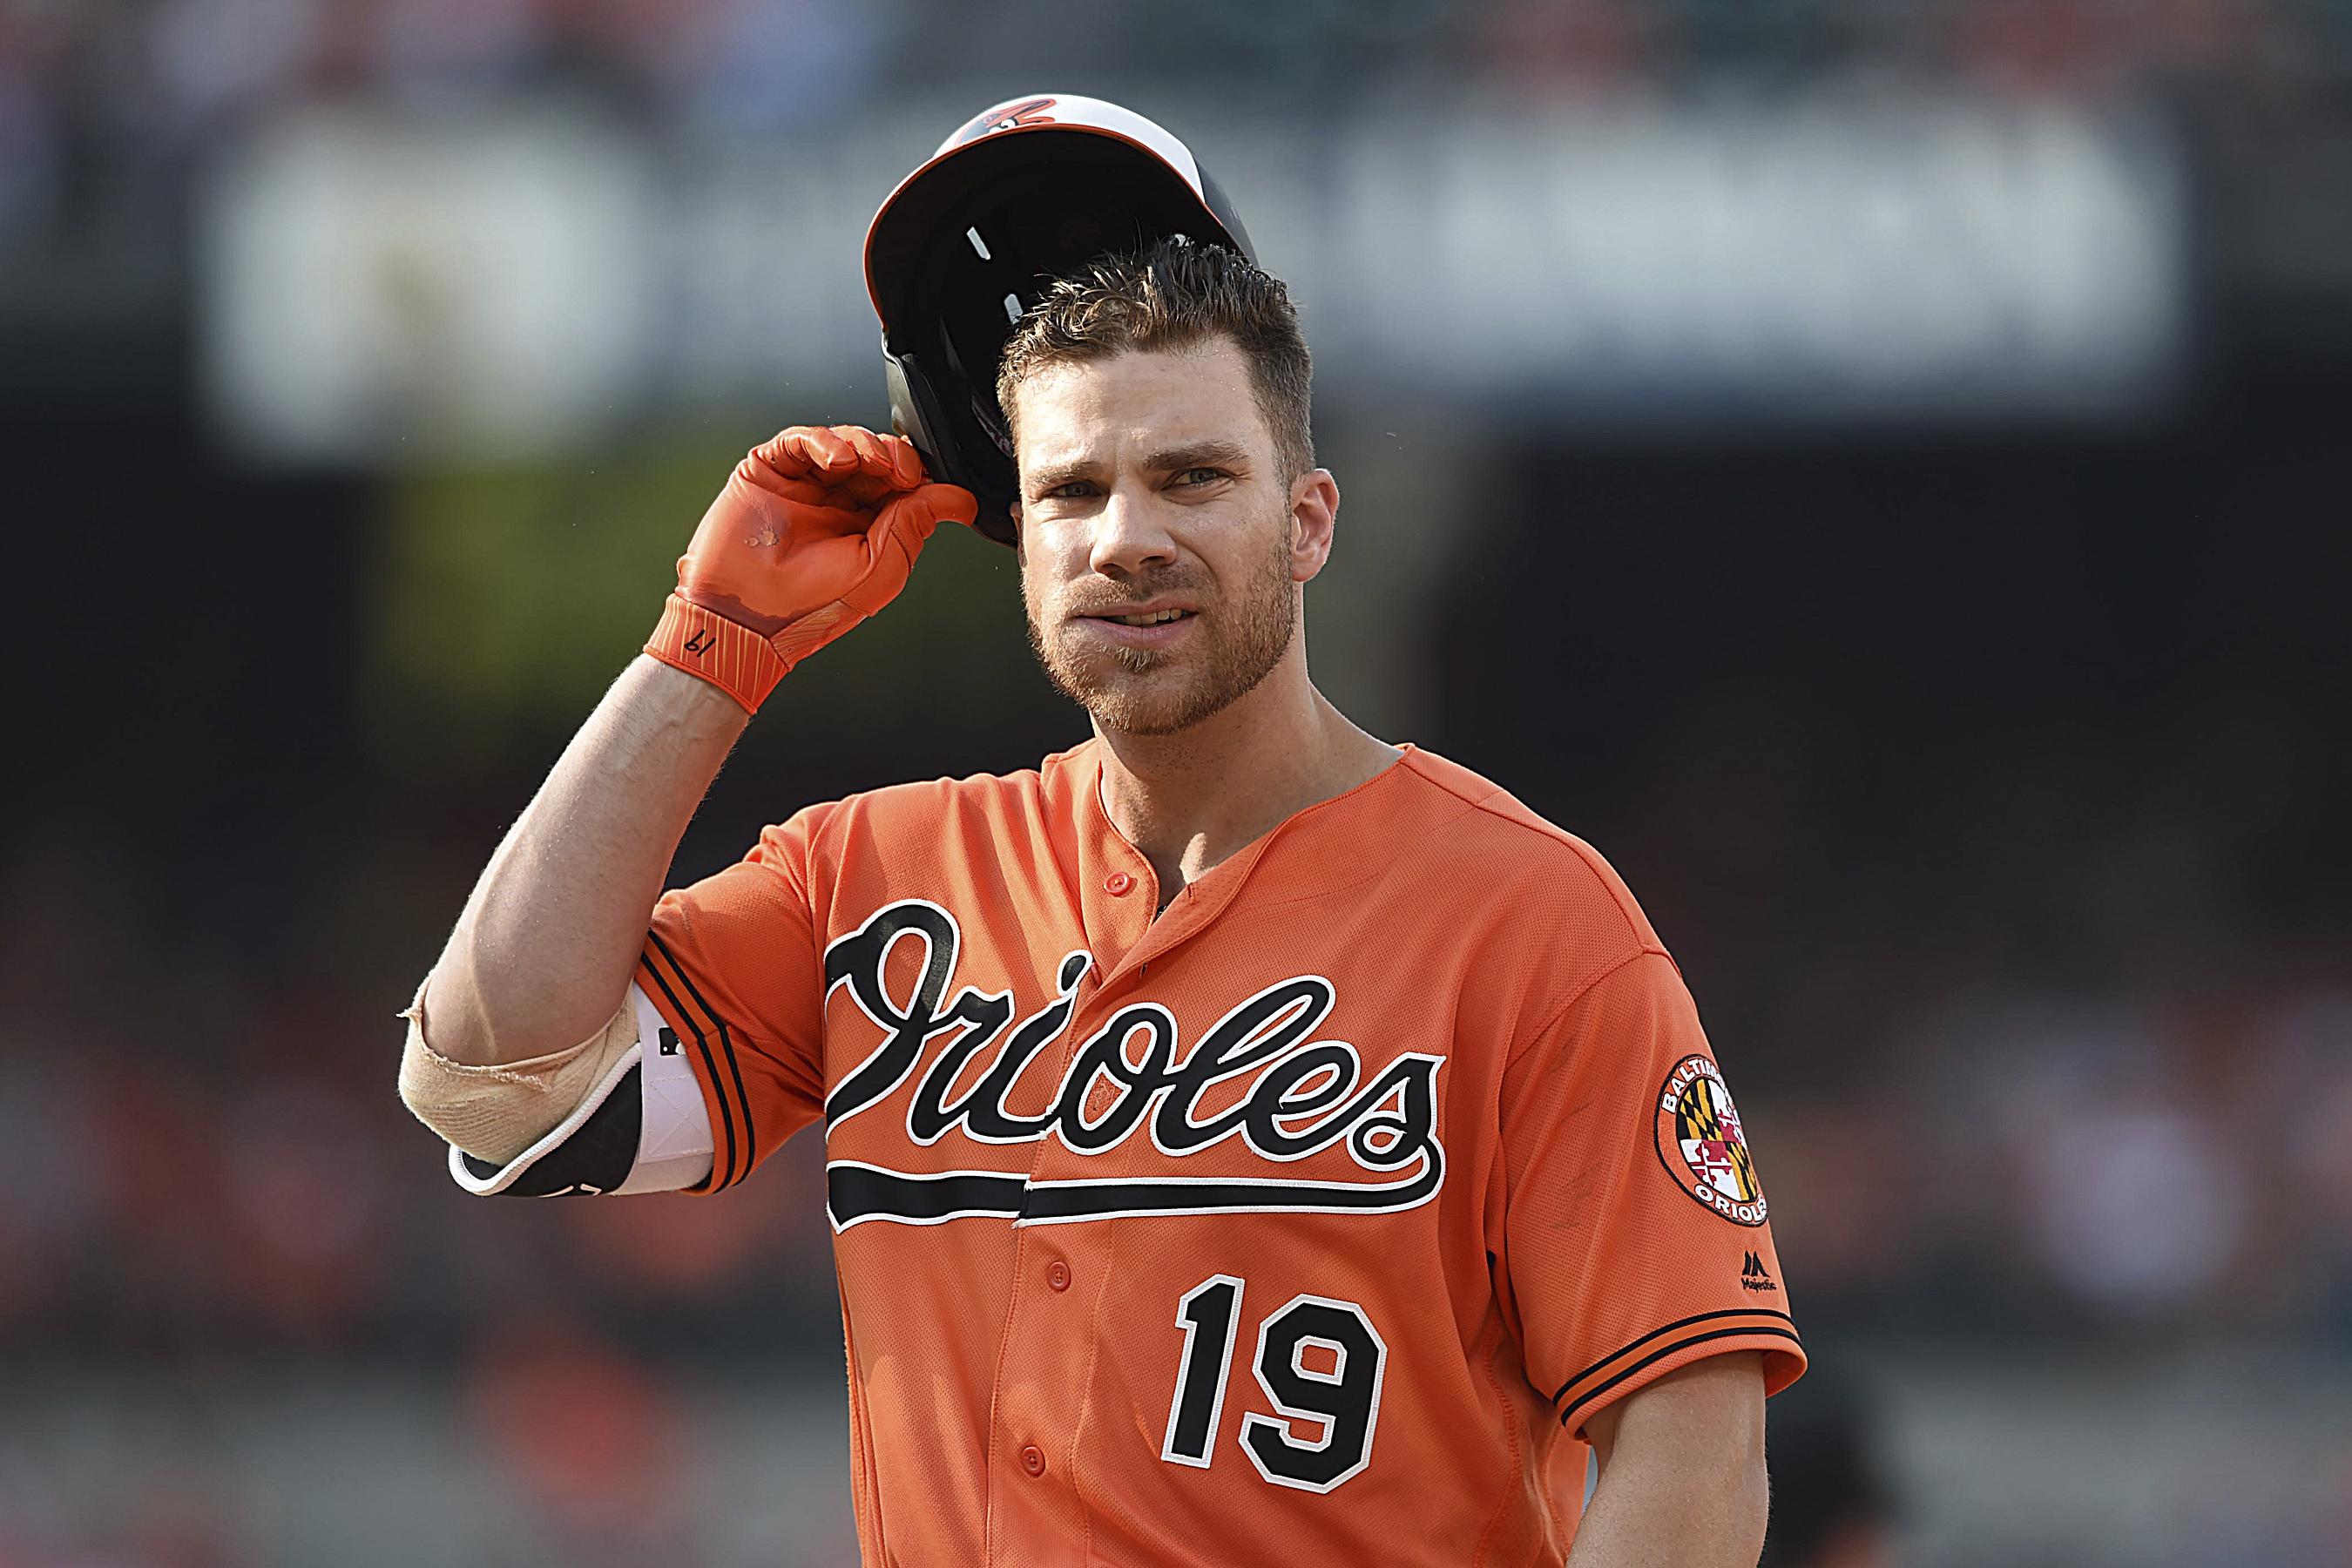 Each MLB Team's Worst Player of the 2018 Regular Season